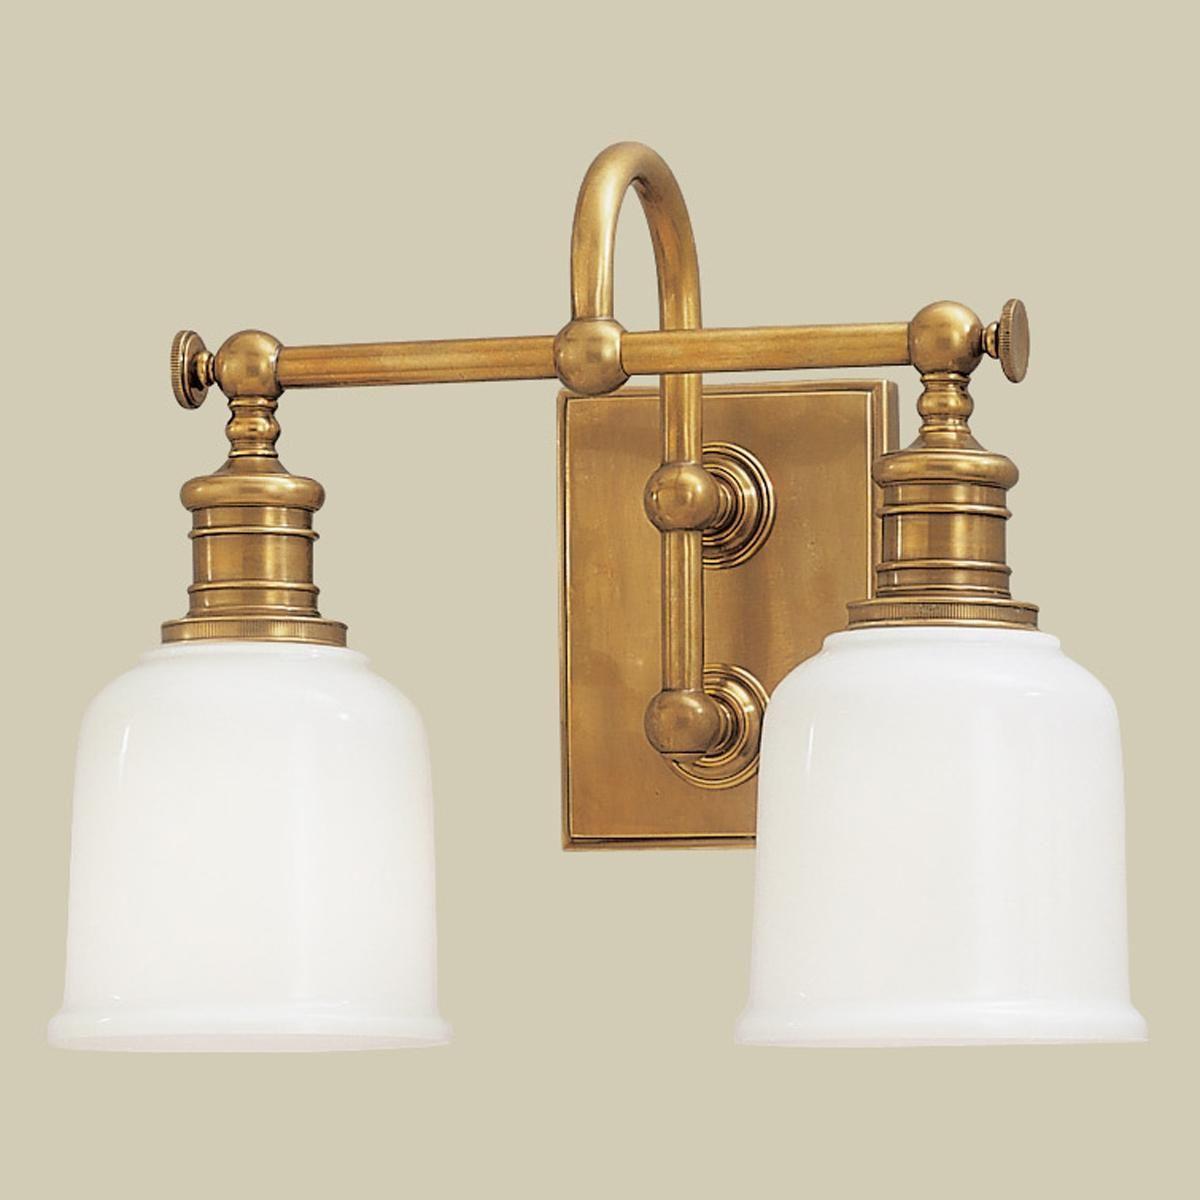 Well Appointed Bath Light Light Bath Light Bath And Lights - Bathroom light fixtures brass finish